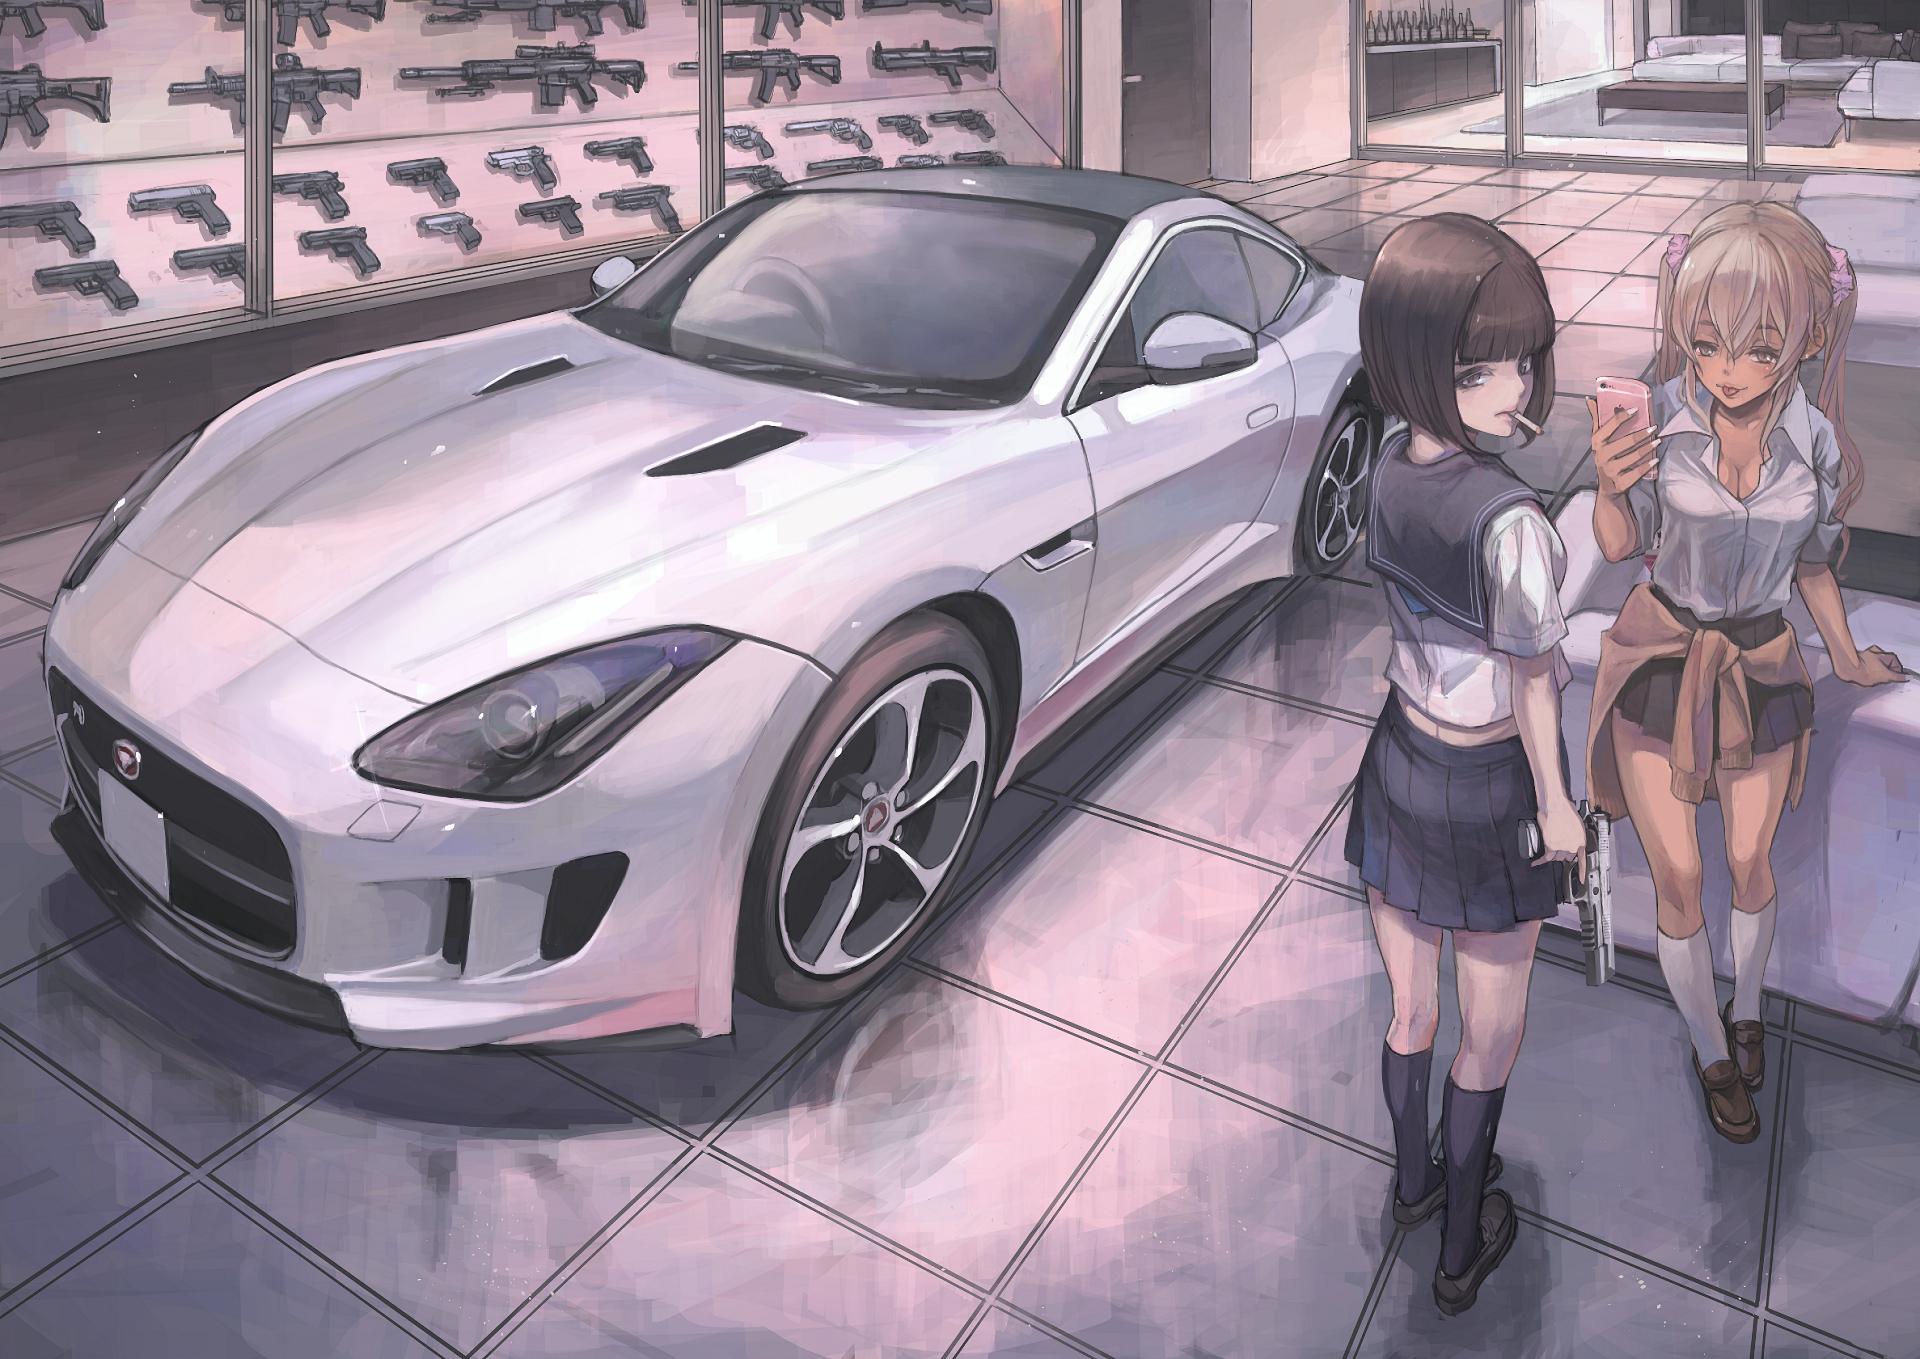 Anime - Original  Original (Anime) Girl Wallpaper